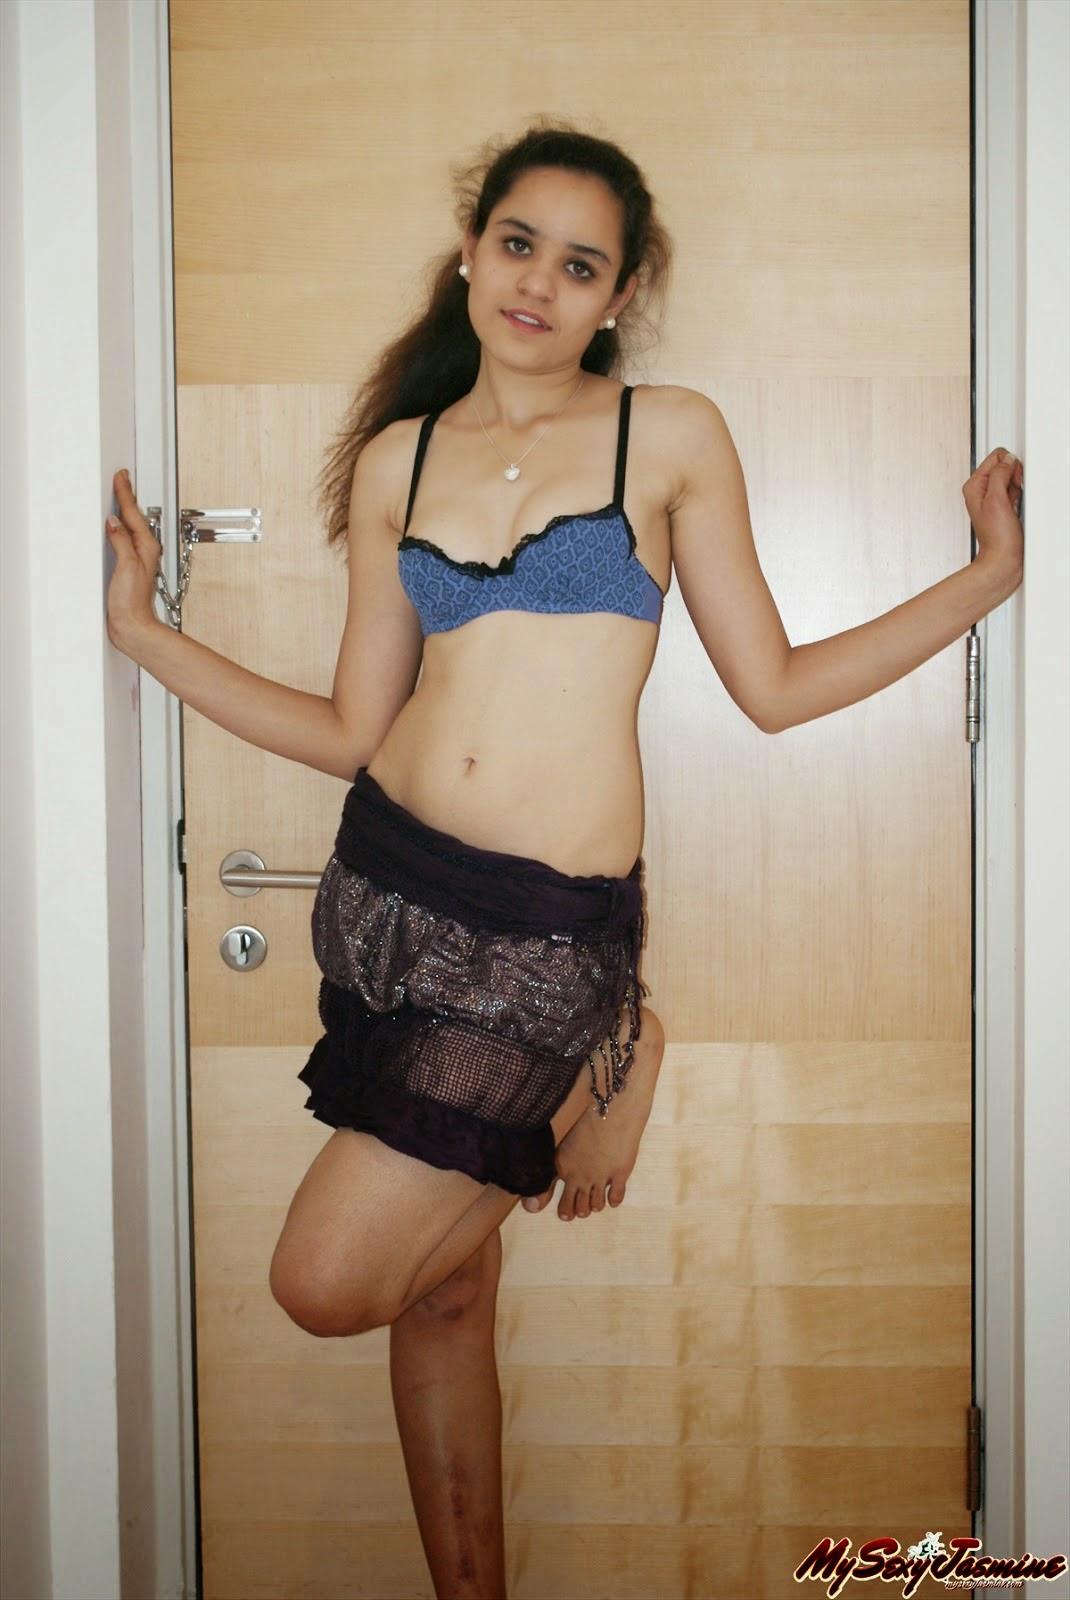 Hot bra girl in public